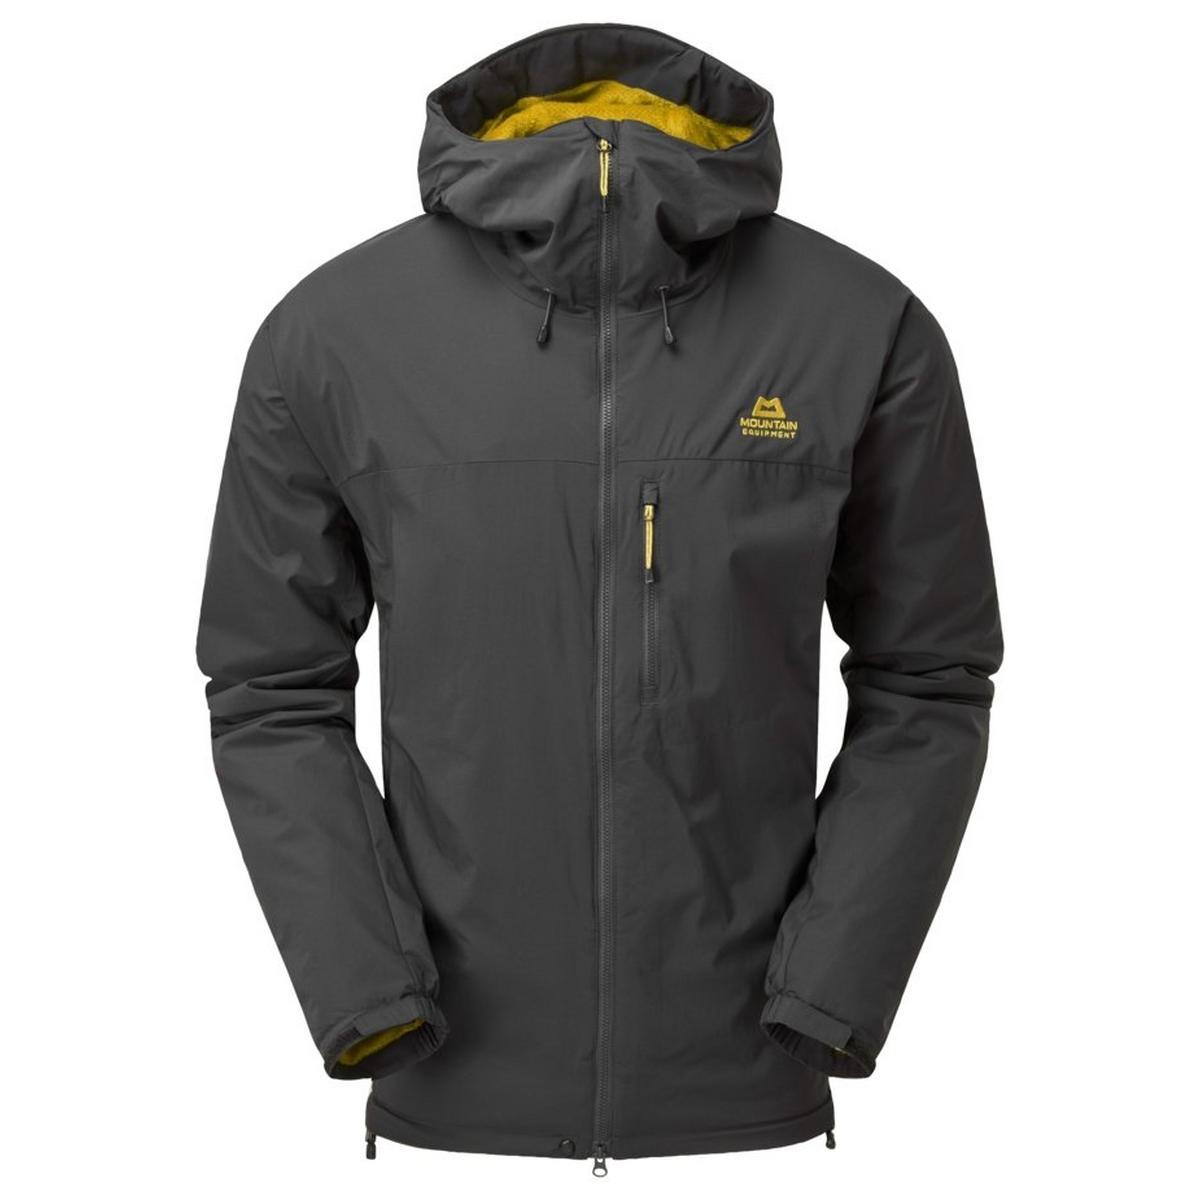 Mountain Equipment Men's Mountain Equipment Kinesis Jacket - Grey